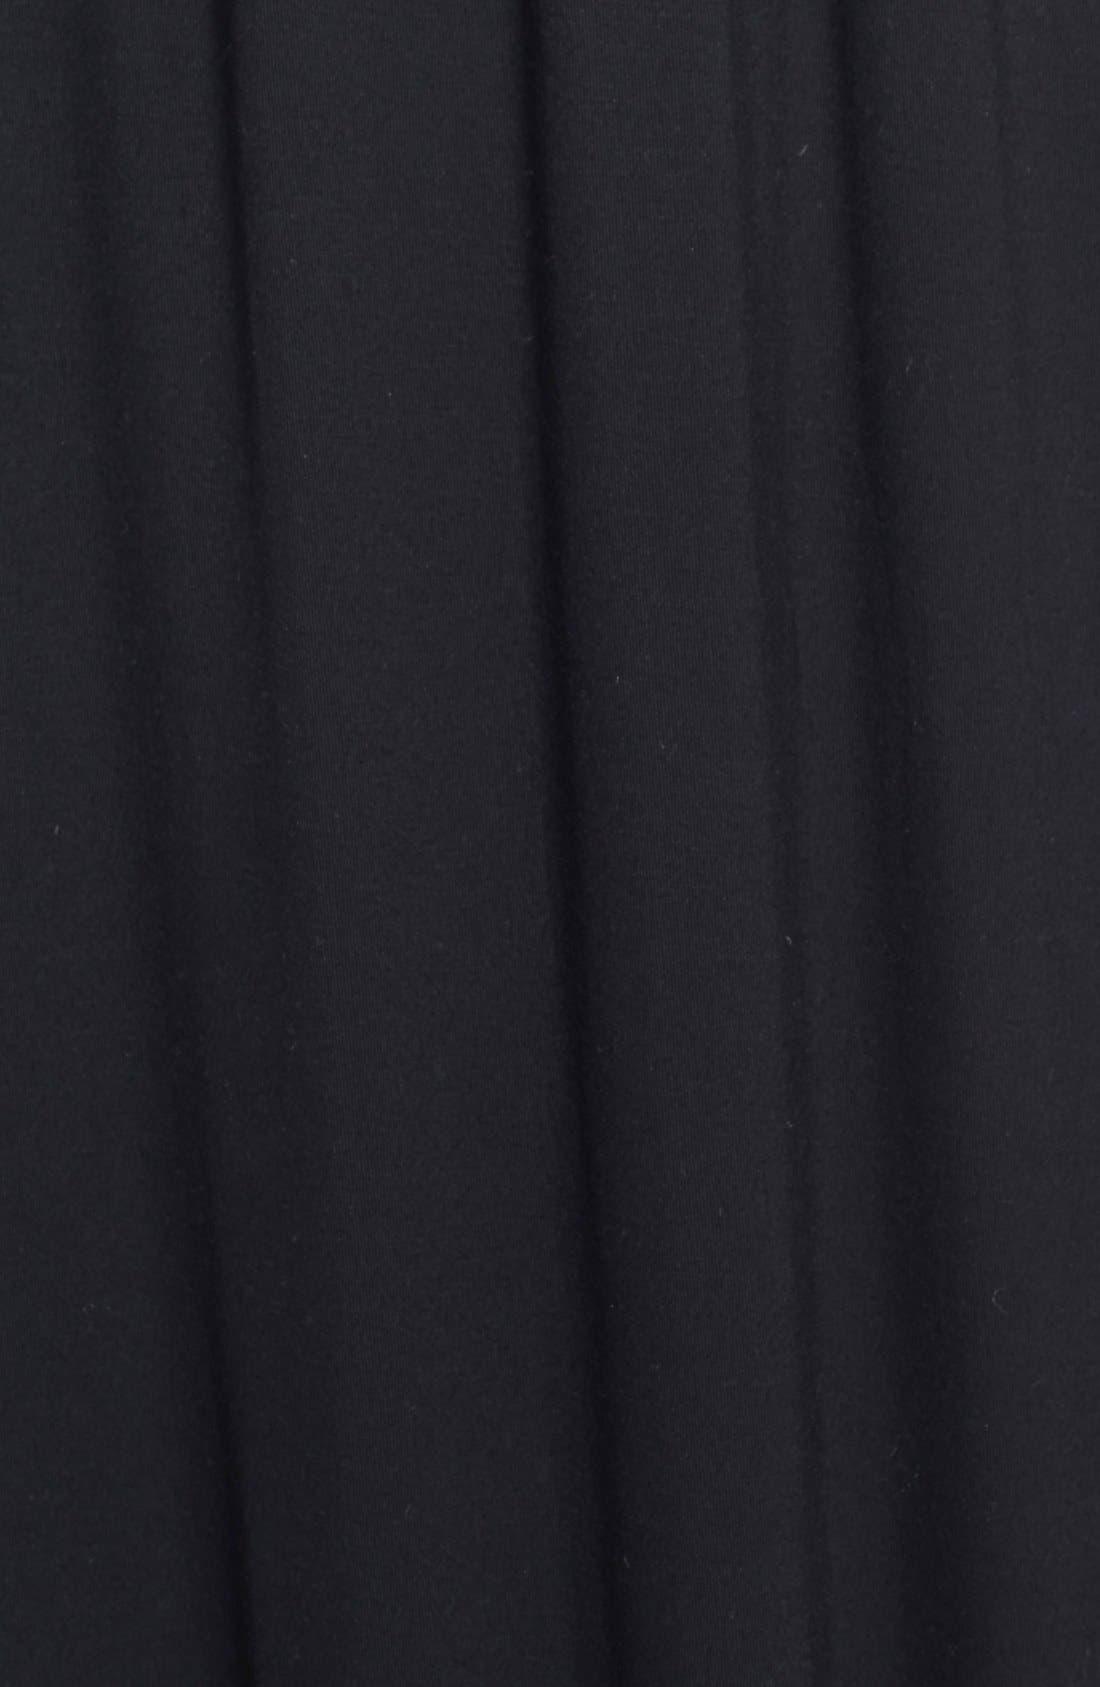 Dolman Sleeve Maxi Dress,                             Alternate thumbnail 2, color,                             001